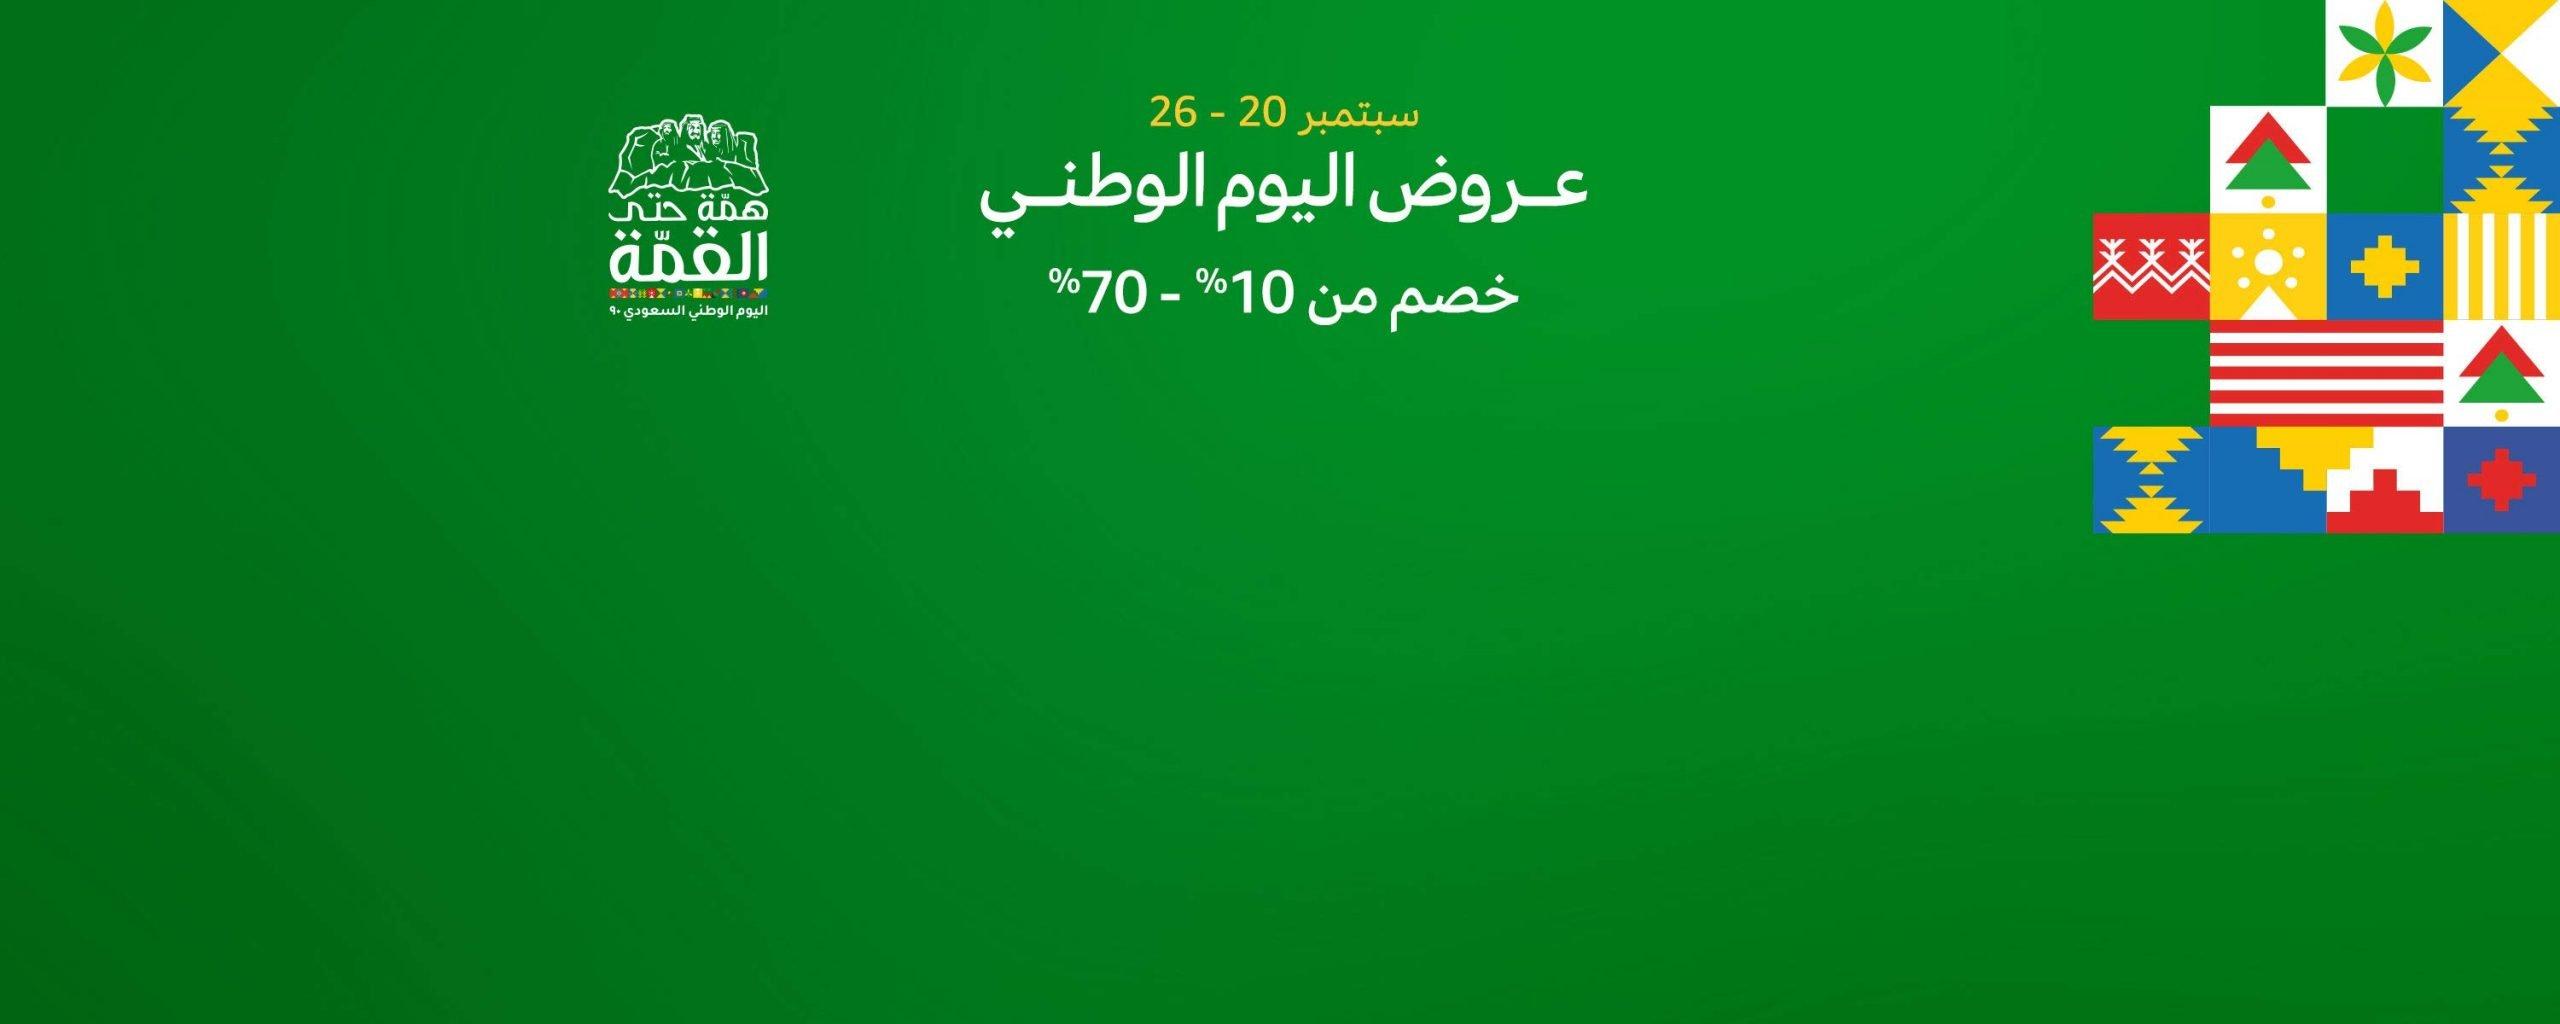 Photo of عروض اليوم الوطنى ٩٠ : عروض امازون السعودية خصومات وتخفيضات متميزة